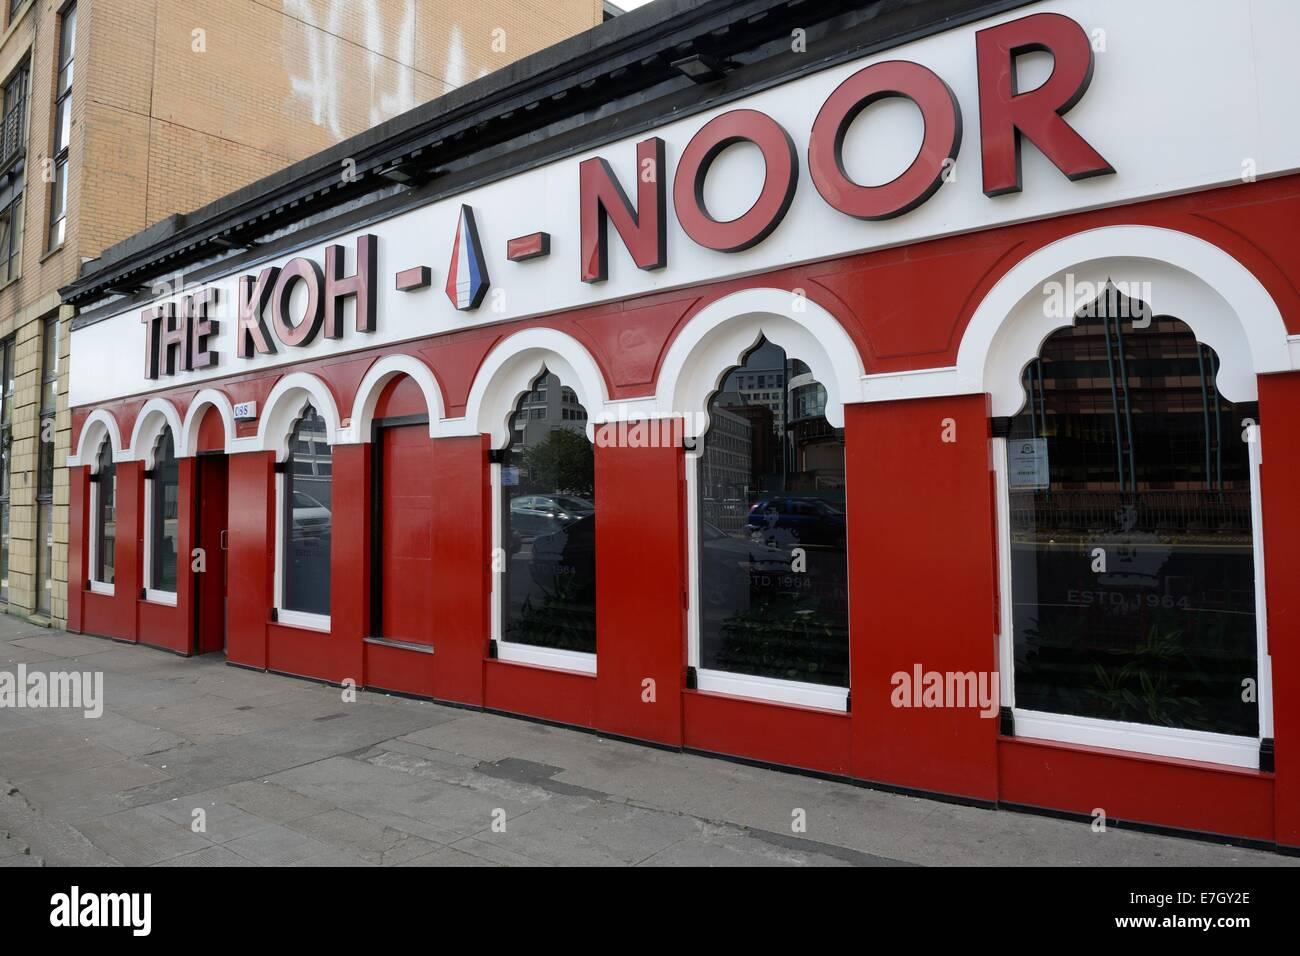 The Koh-i-noor indian restaurant, Charing Cross, Glasgow - Stock Image